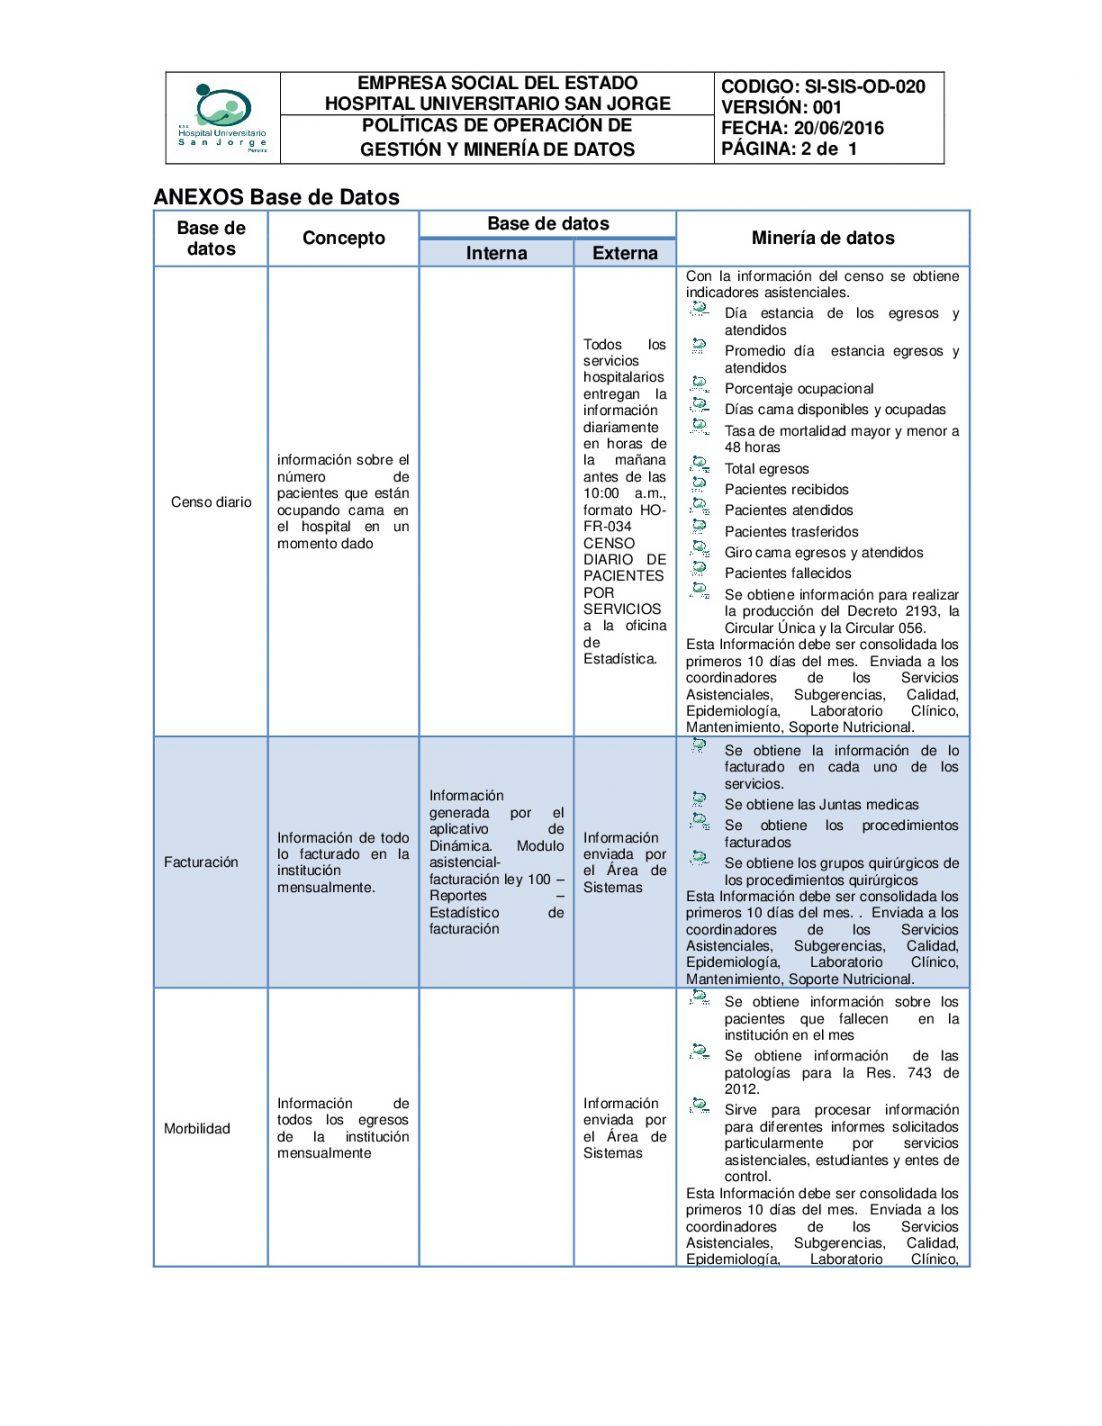 SI-SIS-OD-020-POLITICAS-DE-OPERACION-002